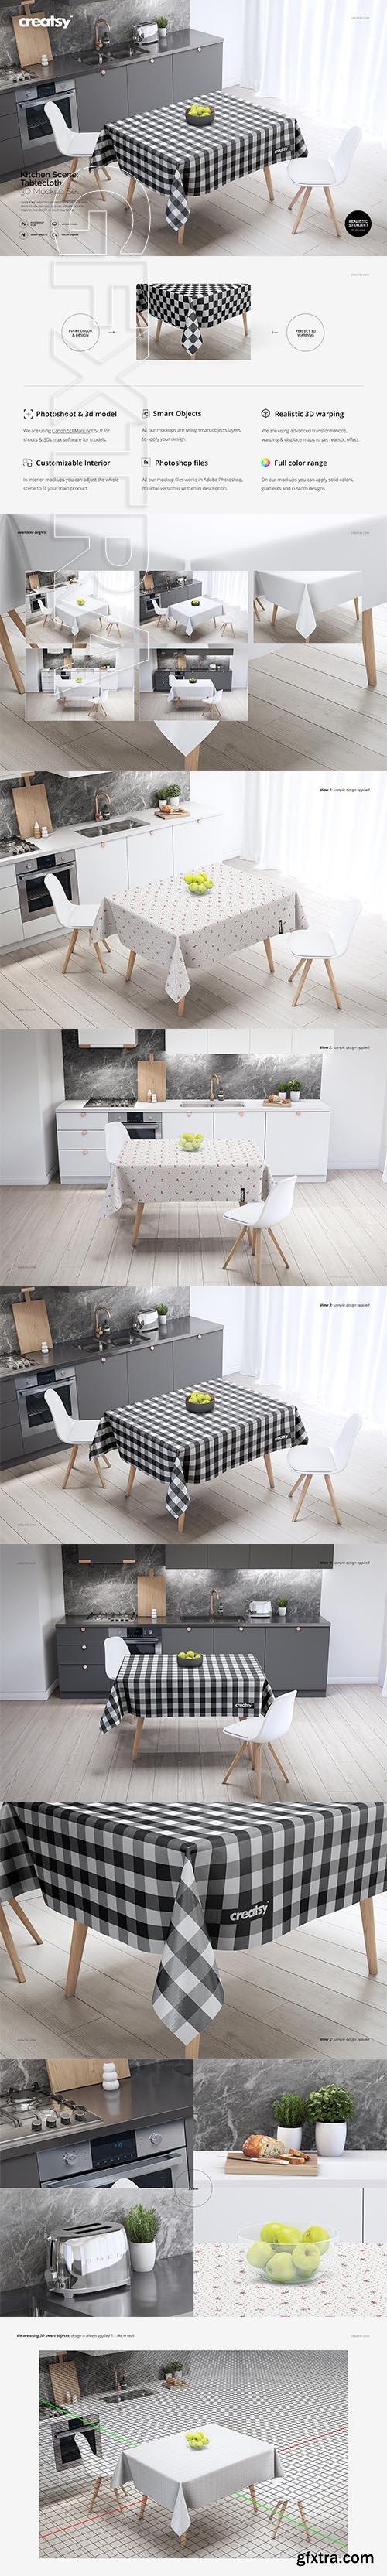 CreativeMarket - Kitchen Scene PVC Tablecloth Mockup 2583126